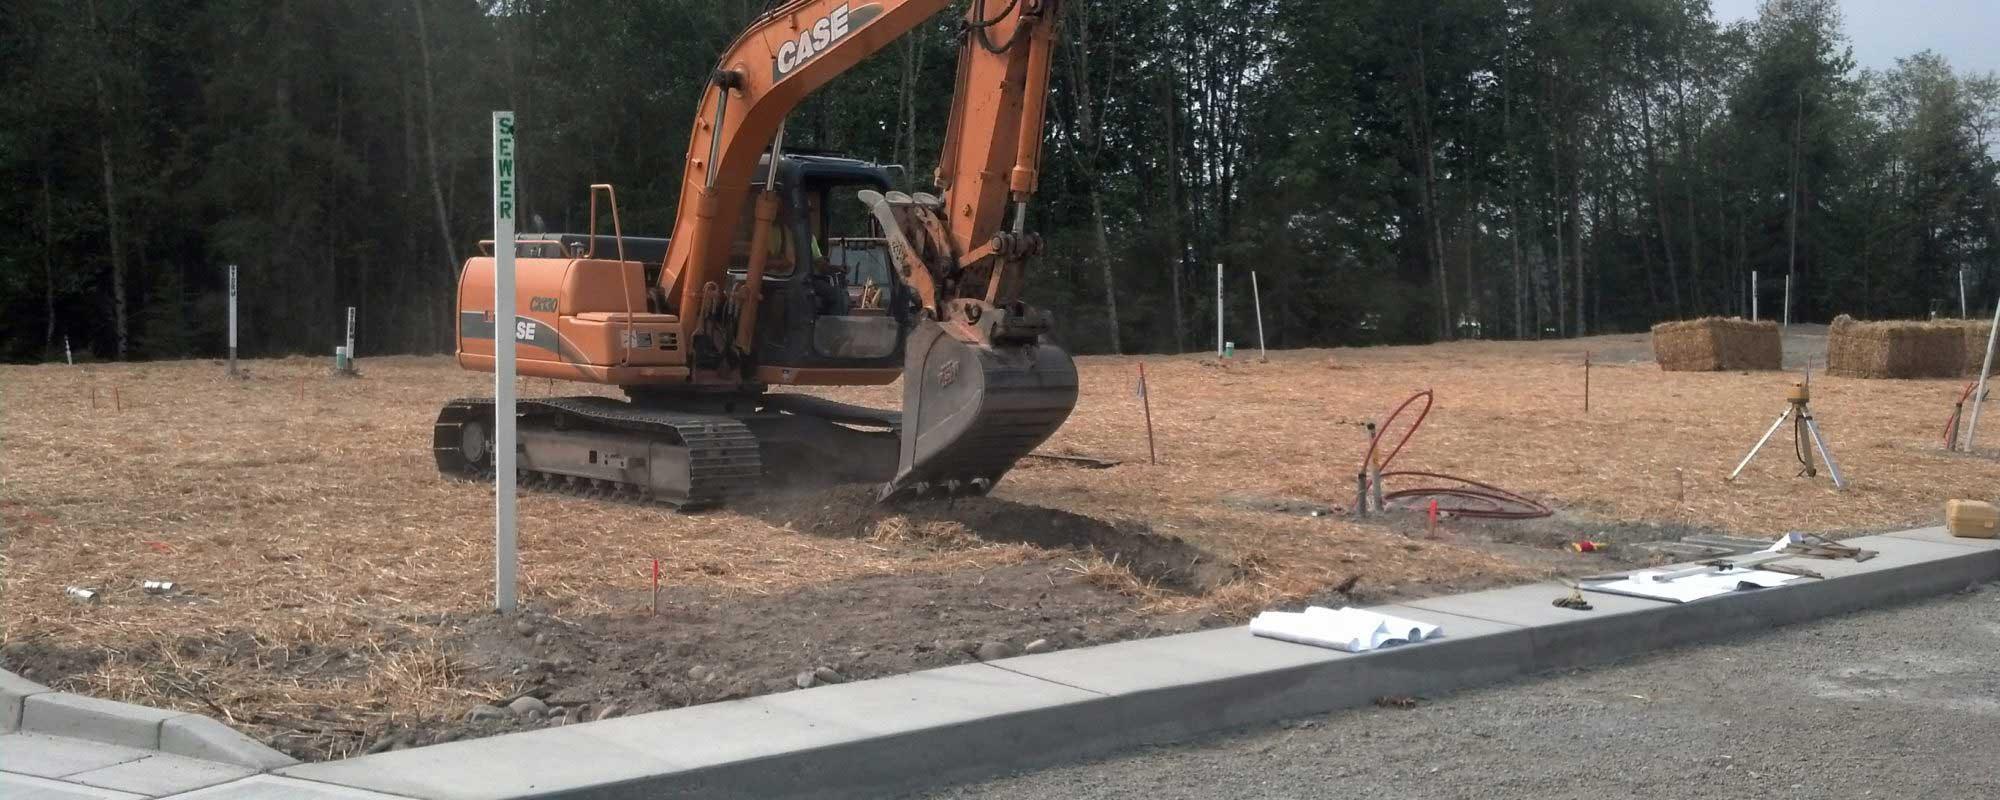 Ichijo Excavator